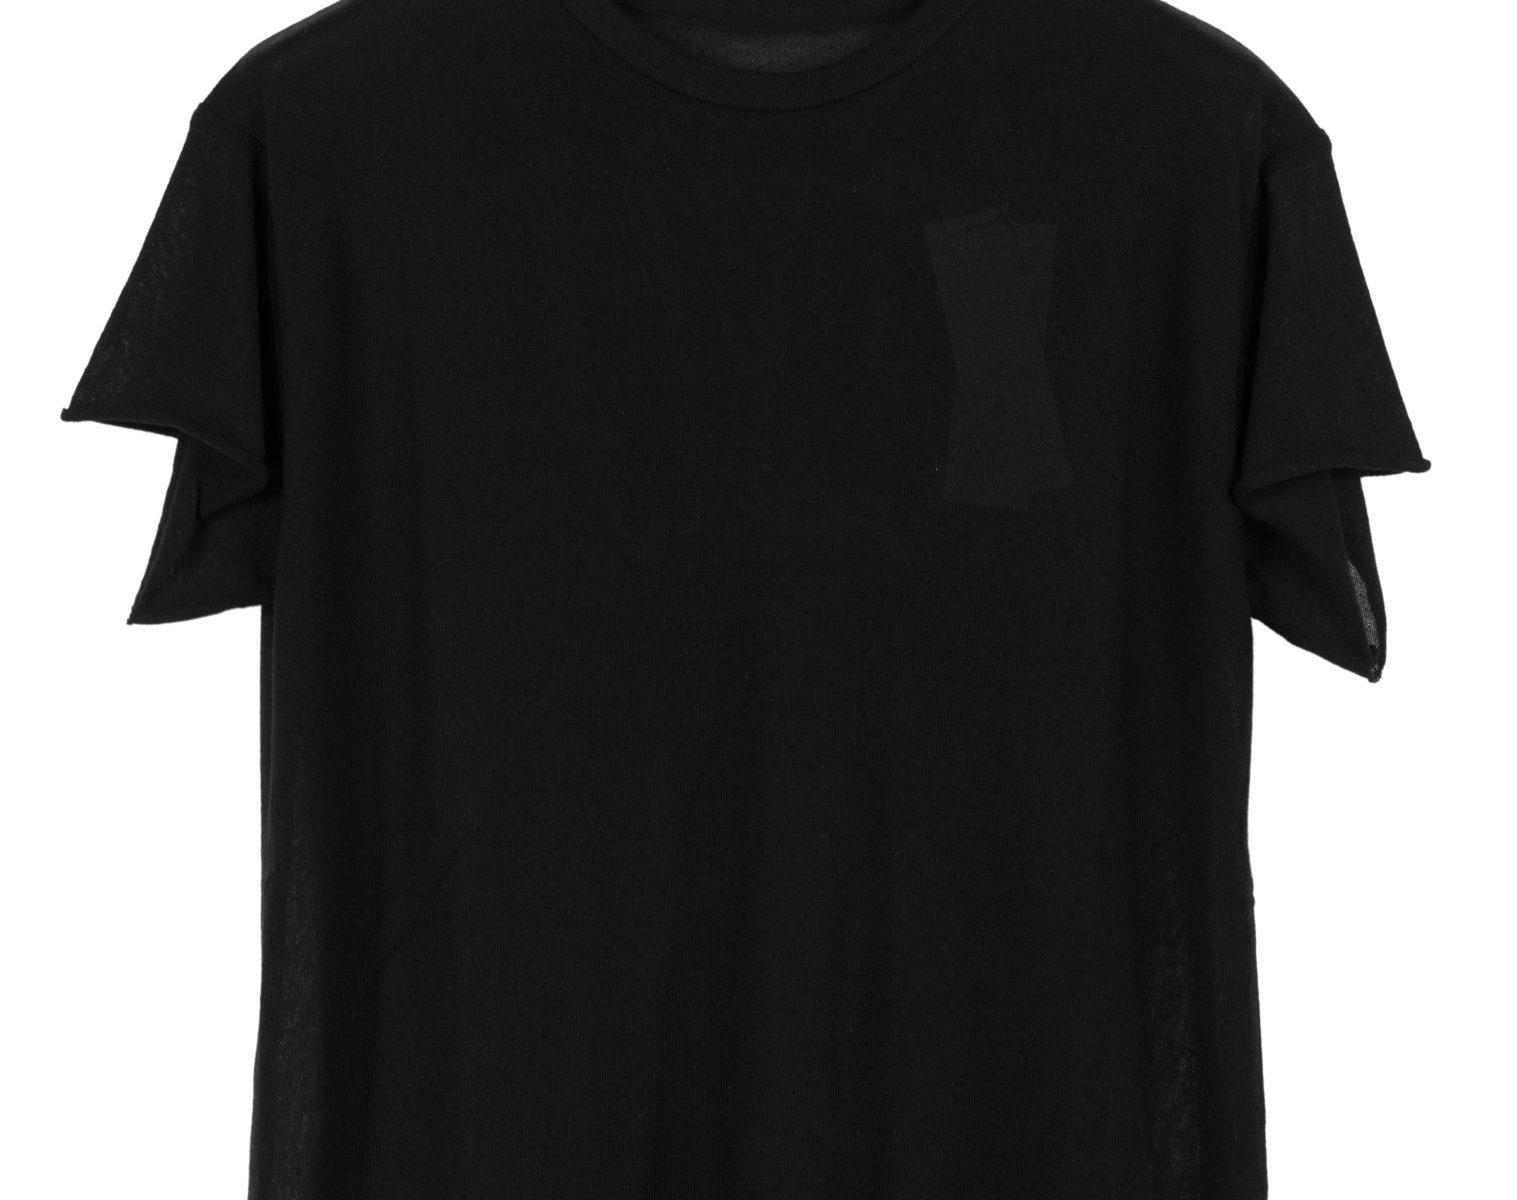 THE ELDER STATESMAN Cut Sew T-Shirt 1